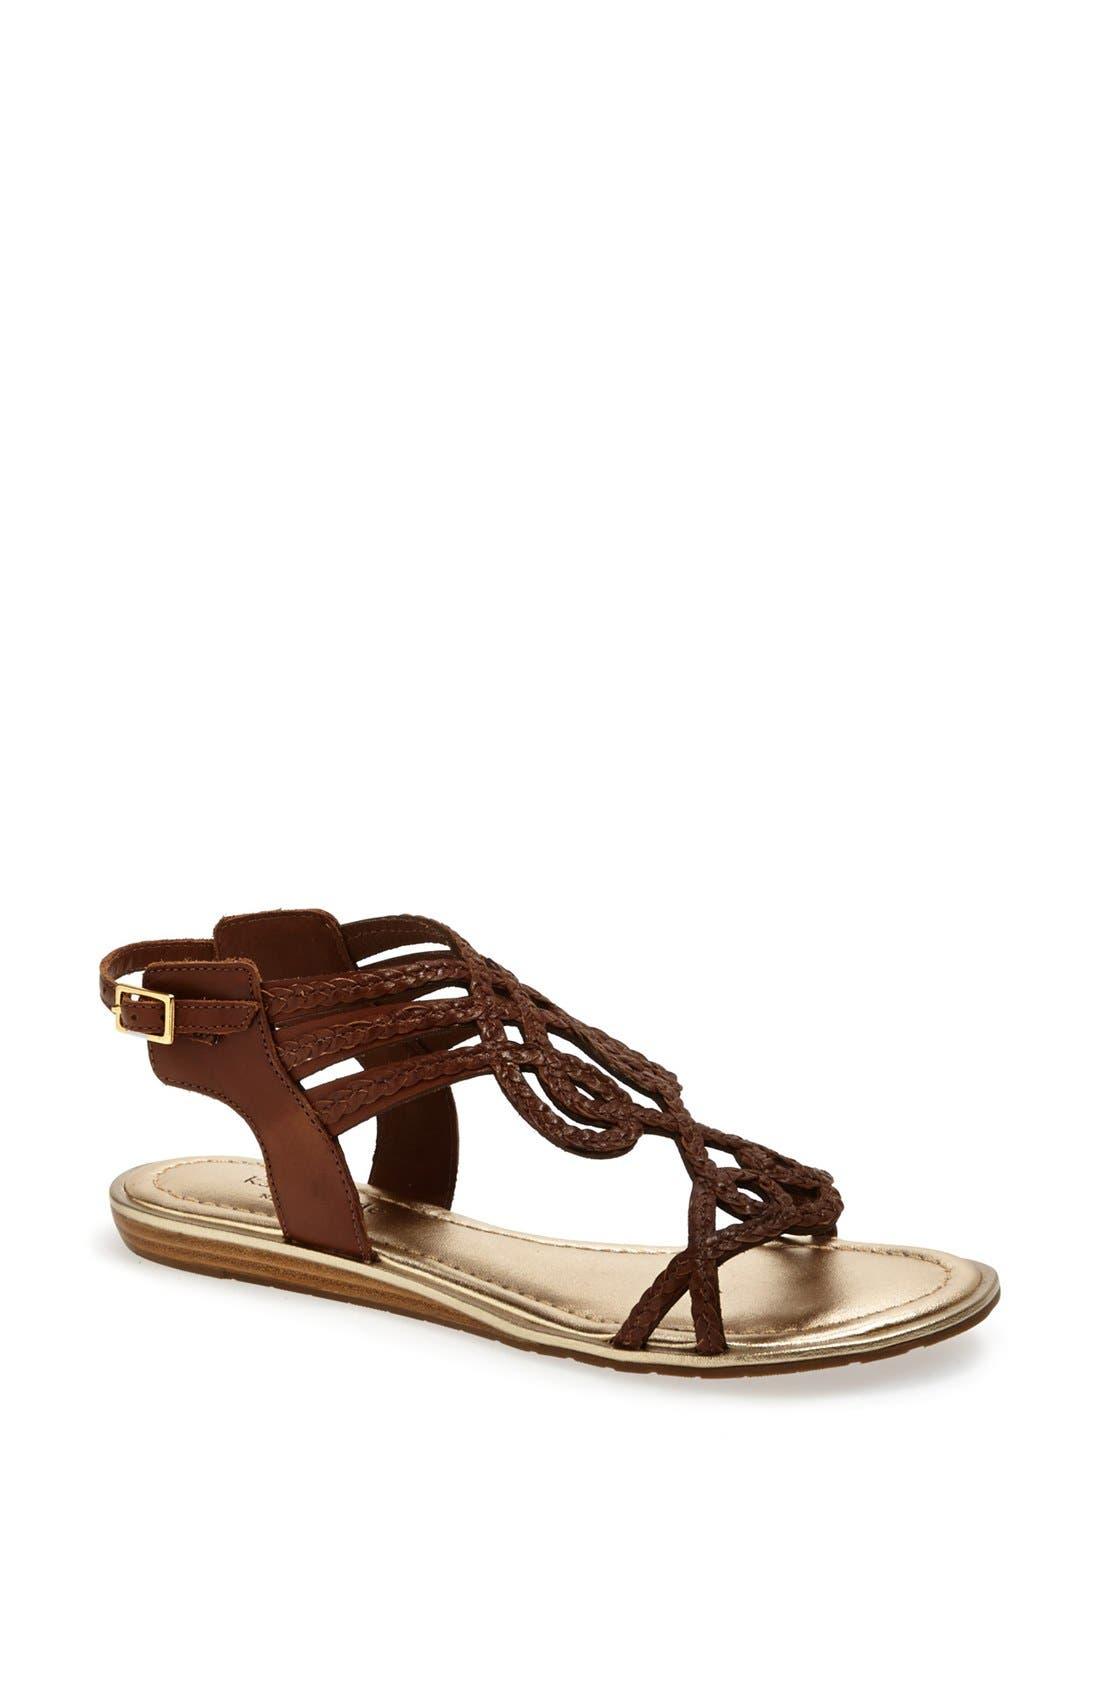 Alternate Image 1 Selected - kate spade new york 'ayn' sandal